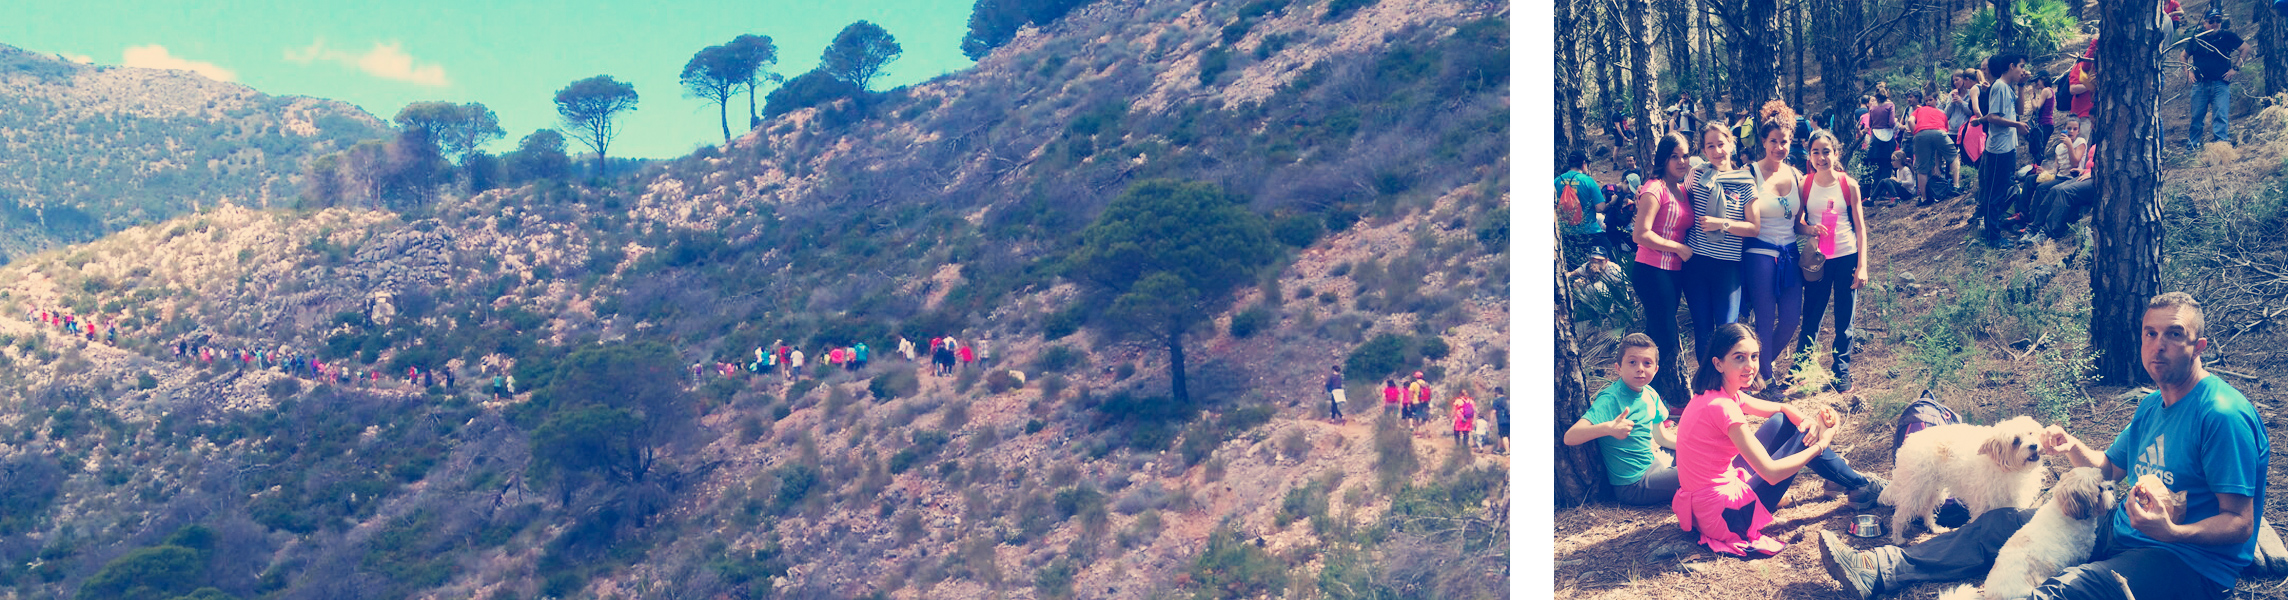 Una ruta por la Sierra de Mijas